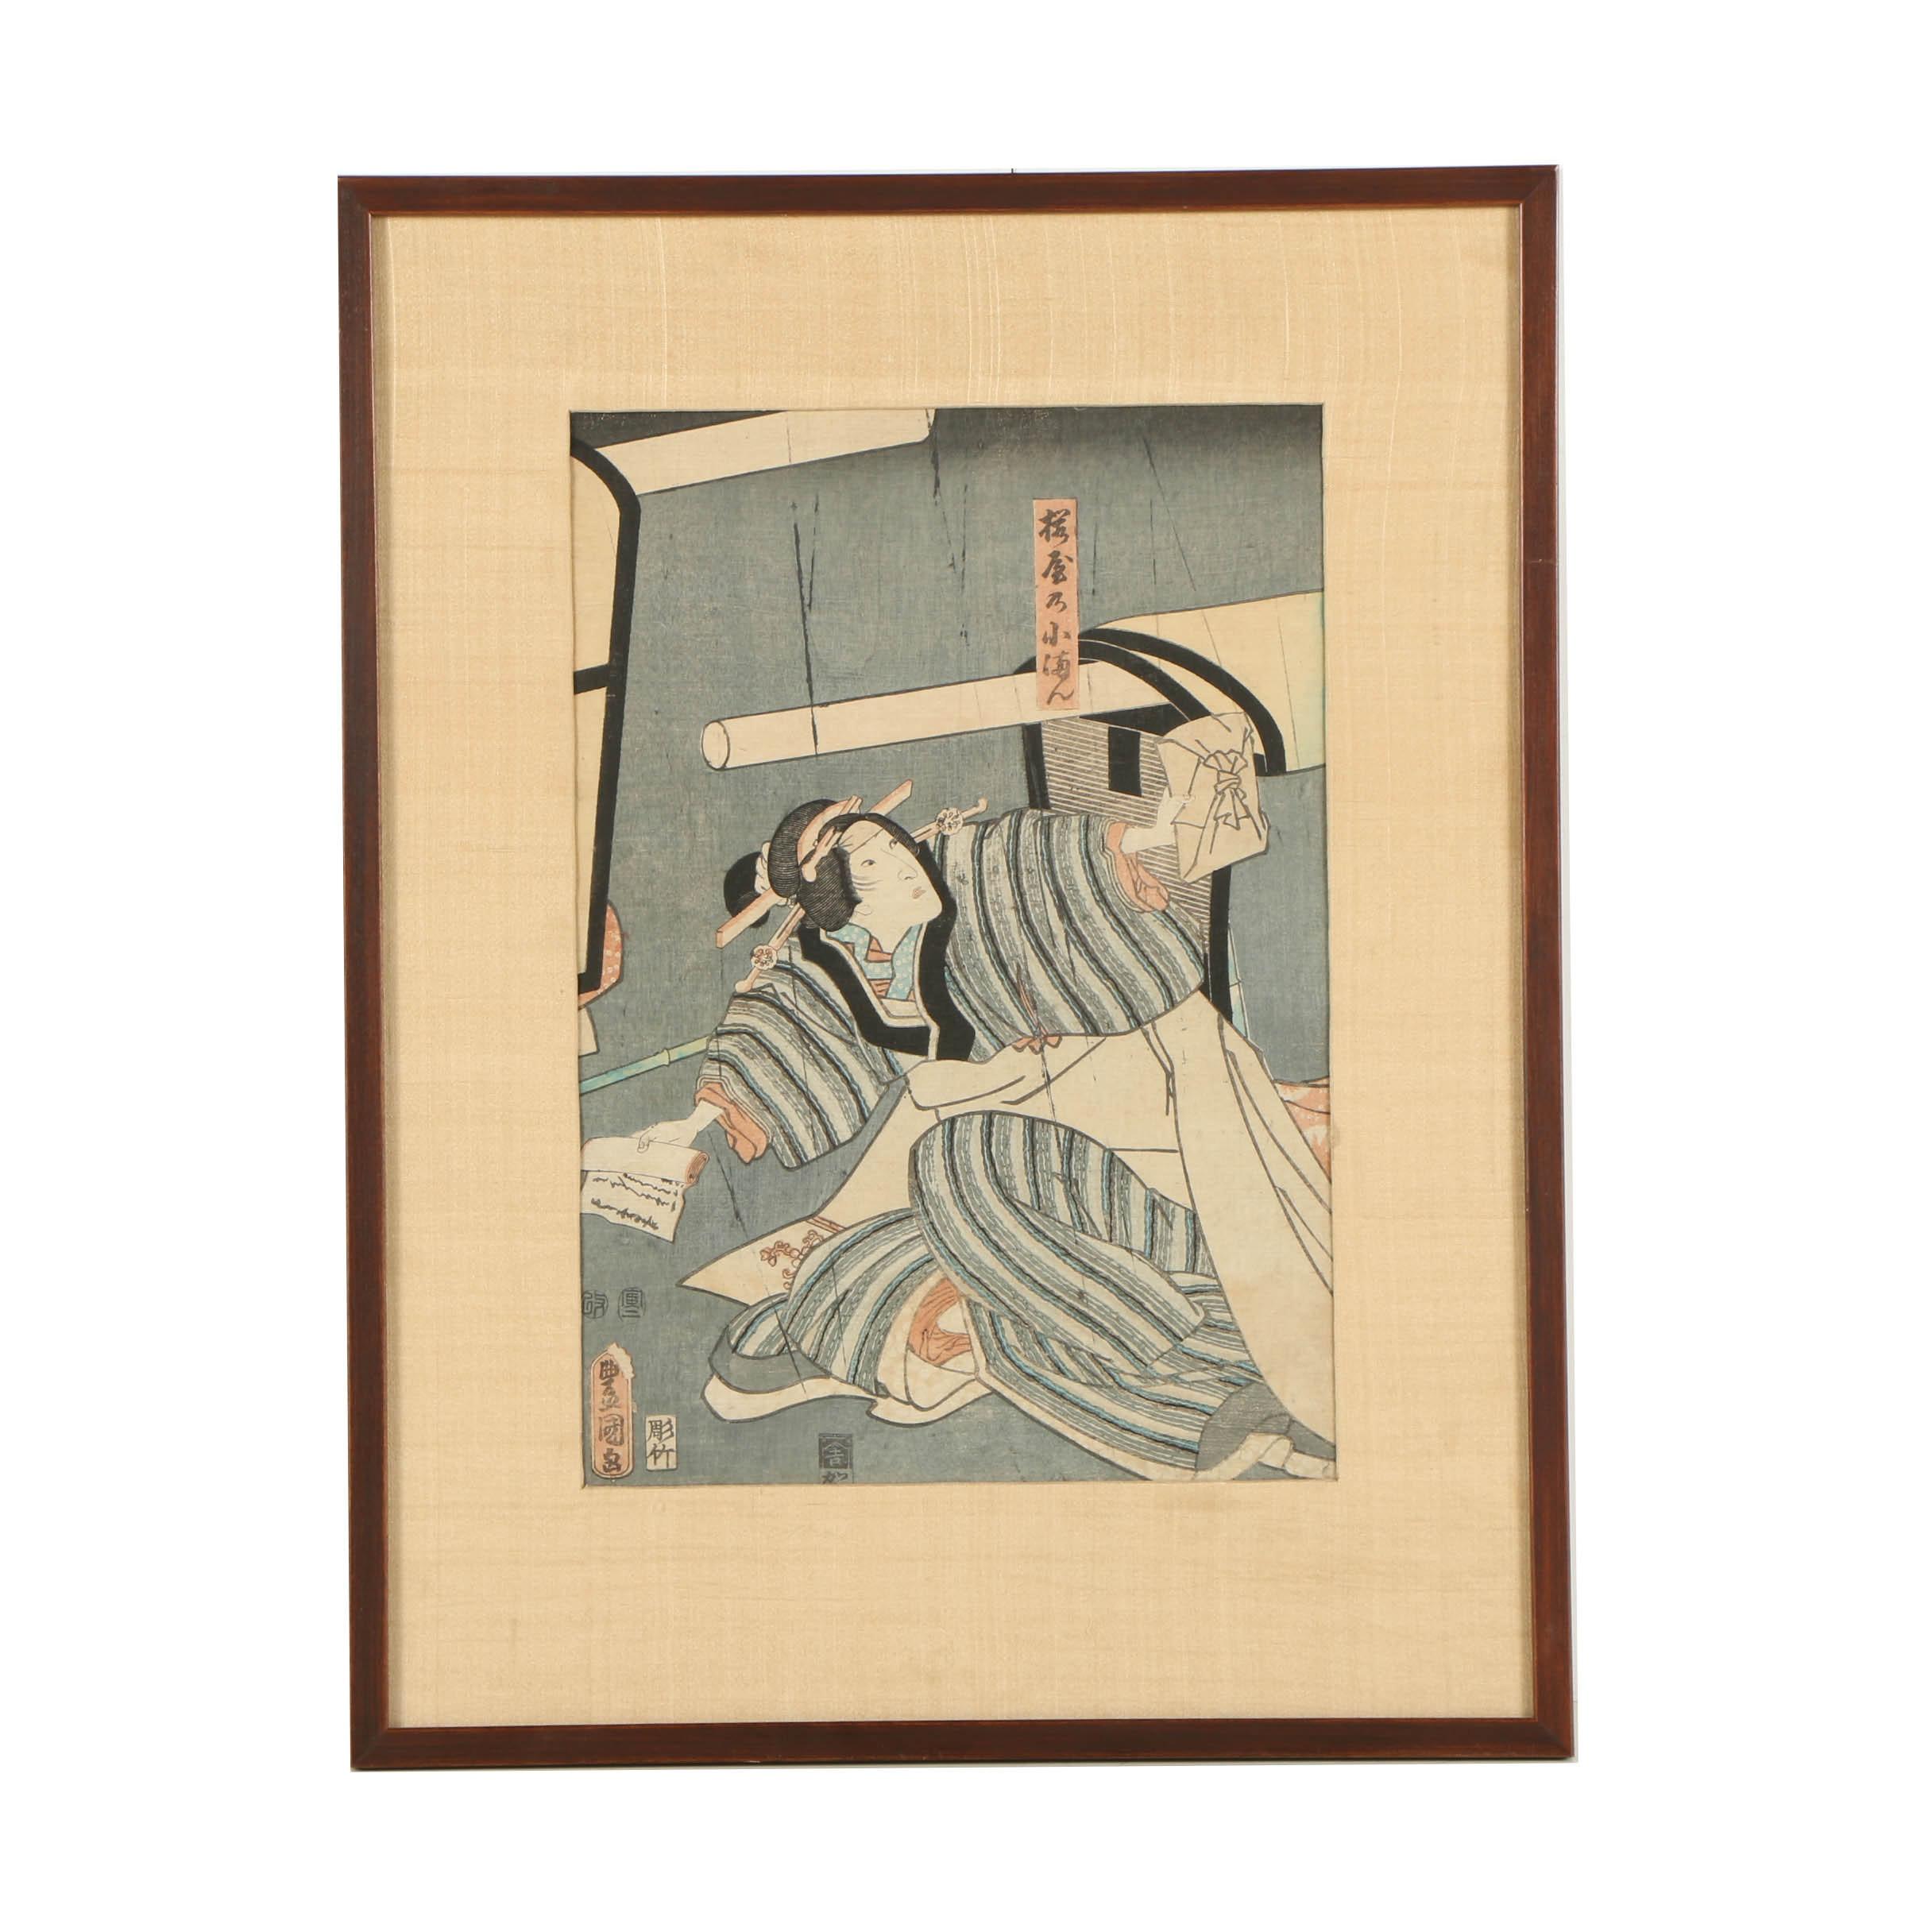 Utagawa Kunisada Woodblock Print on Paper of Figure with Scrolls